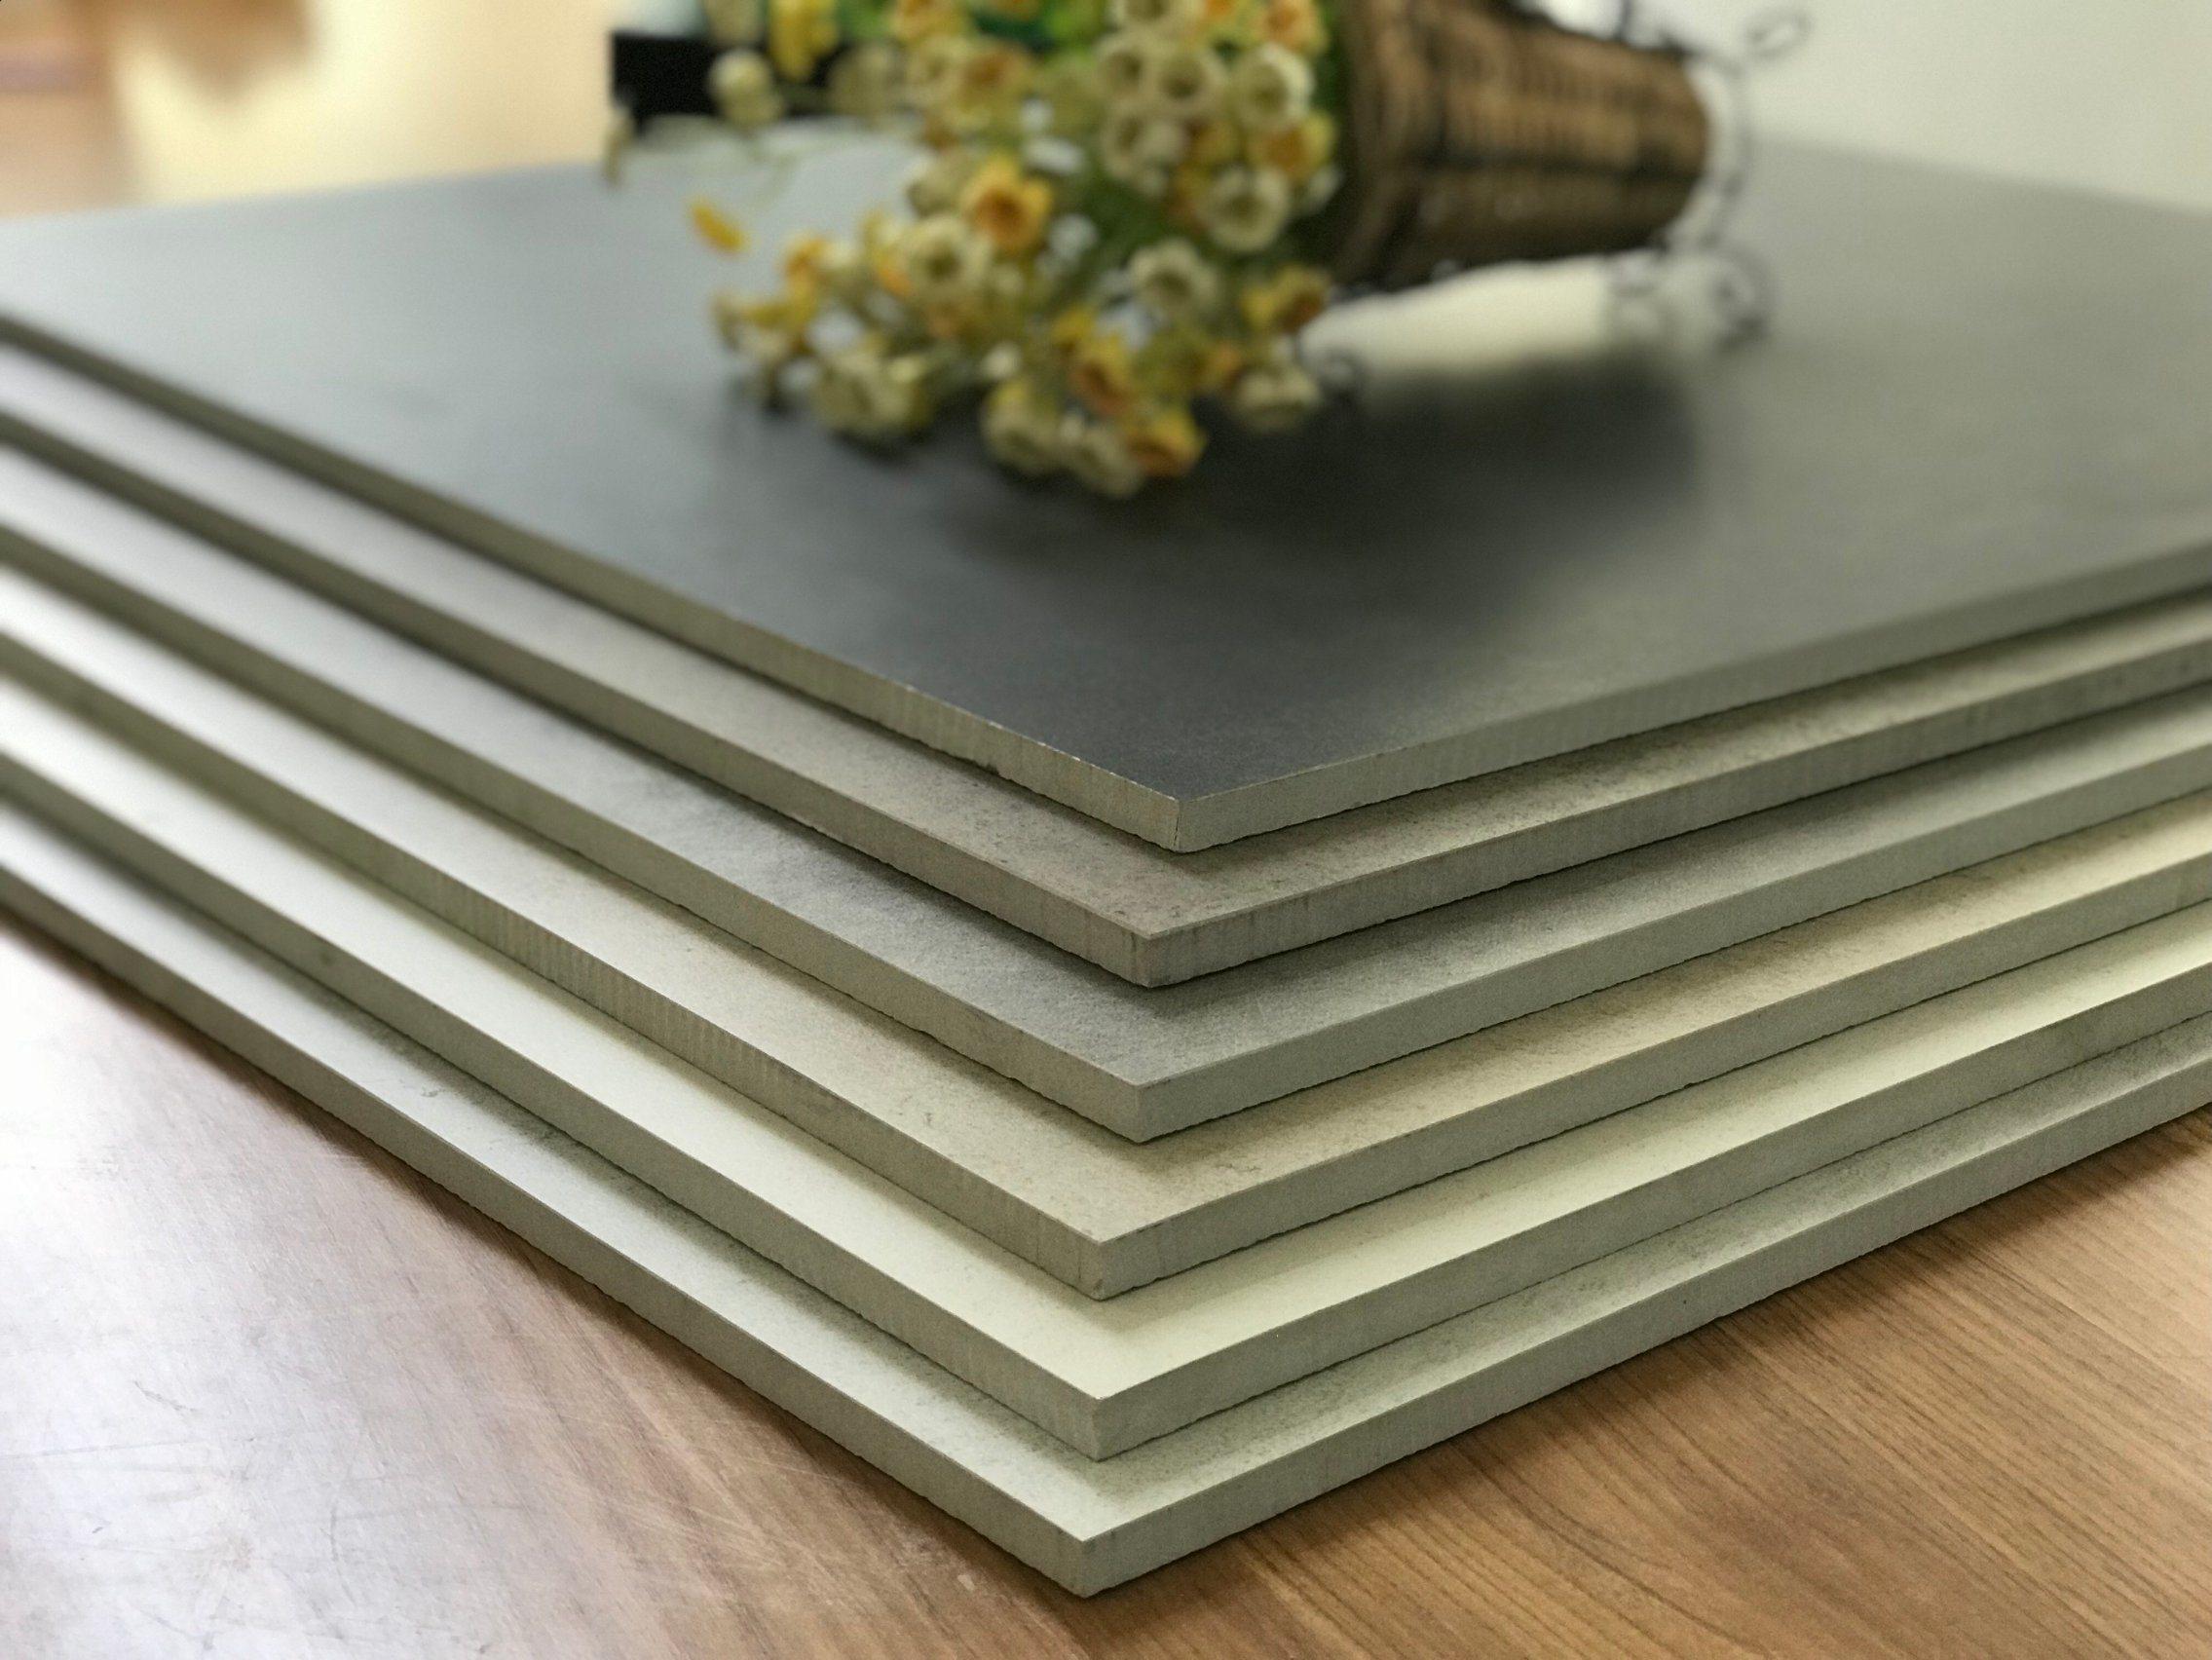 China Glazed Porcelain Floor Tile Ceramic Tile with Best Price ...